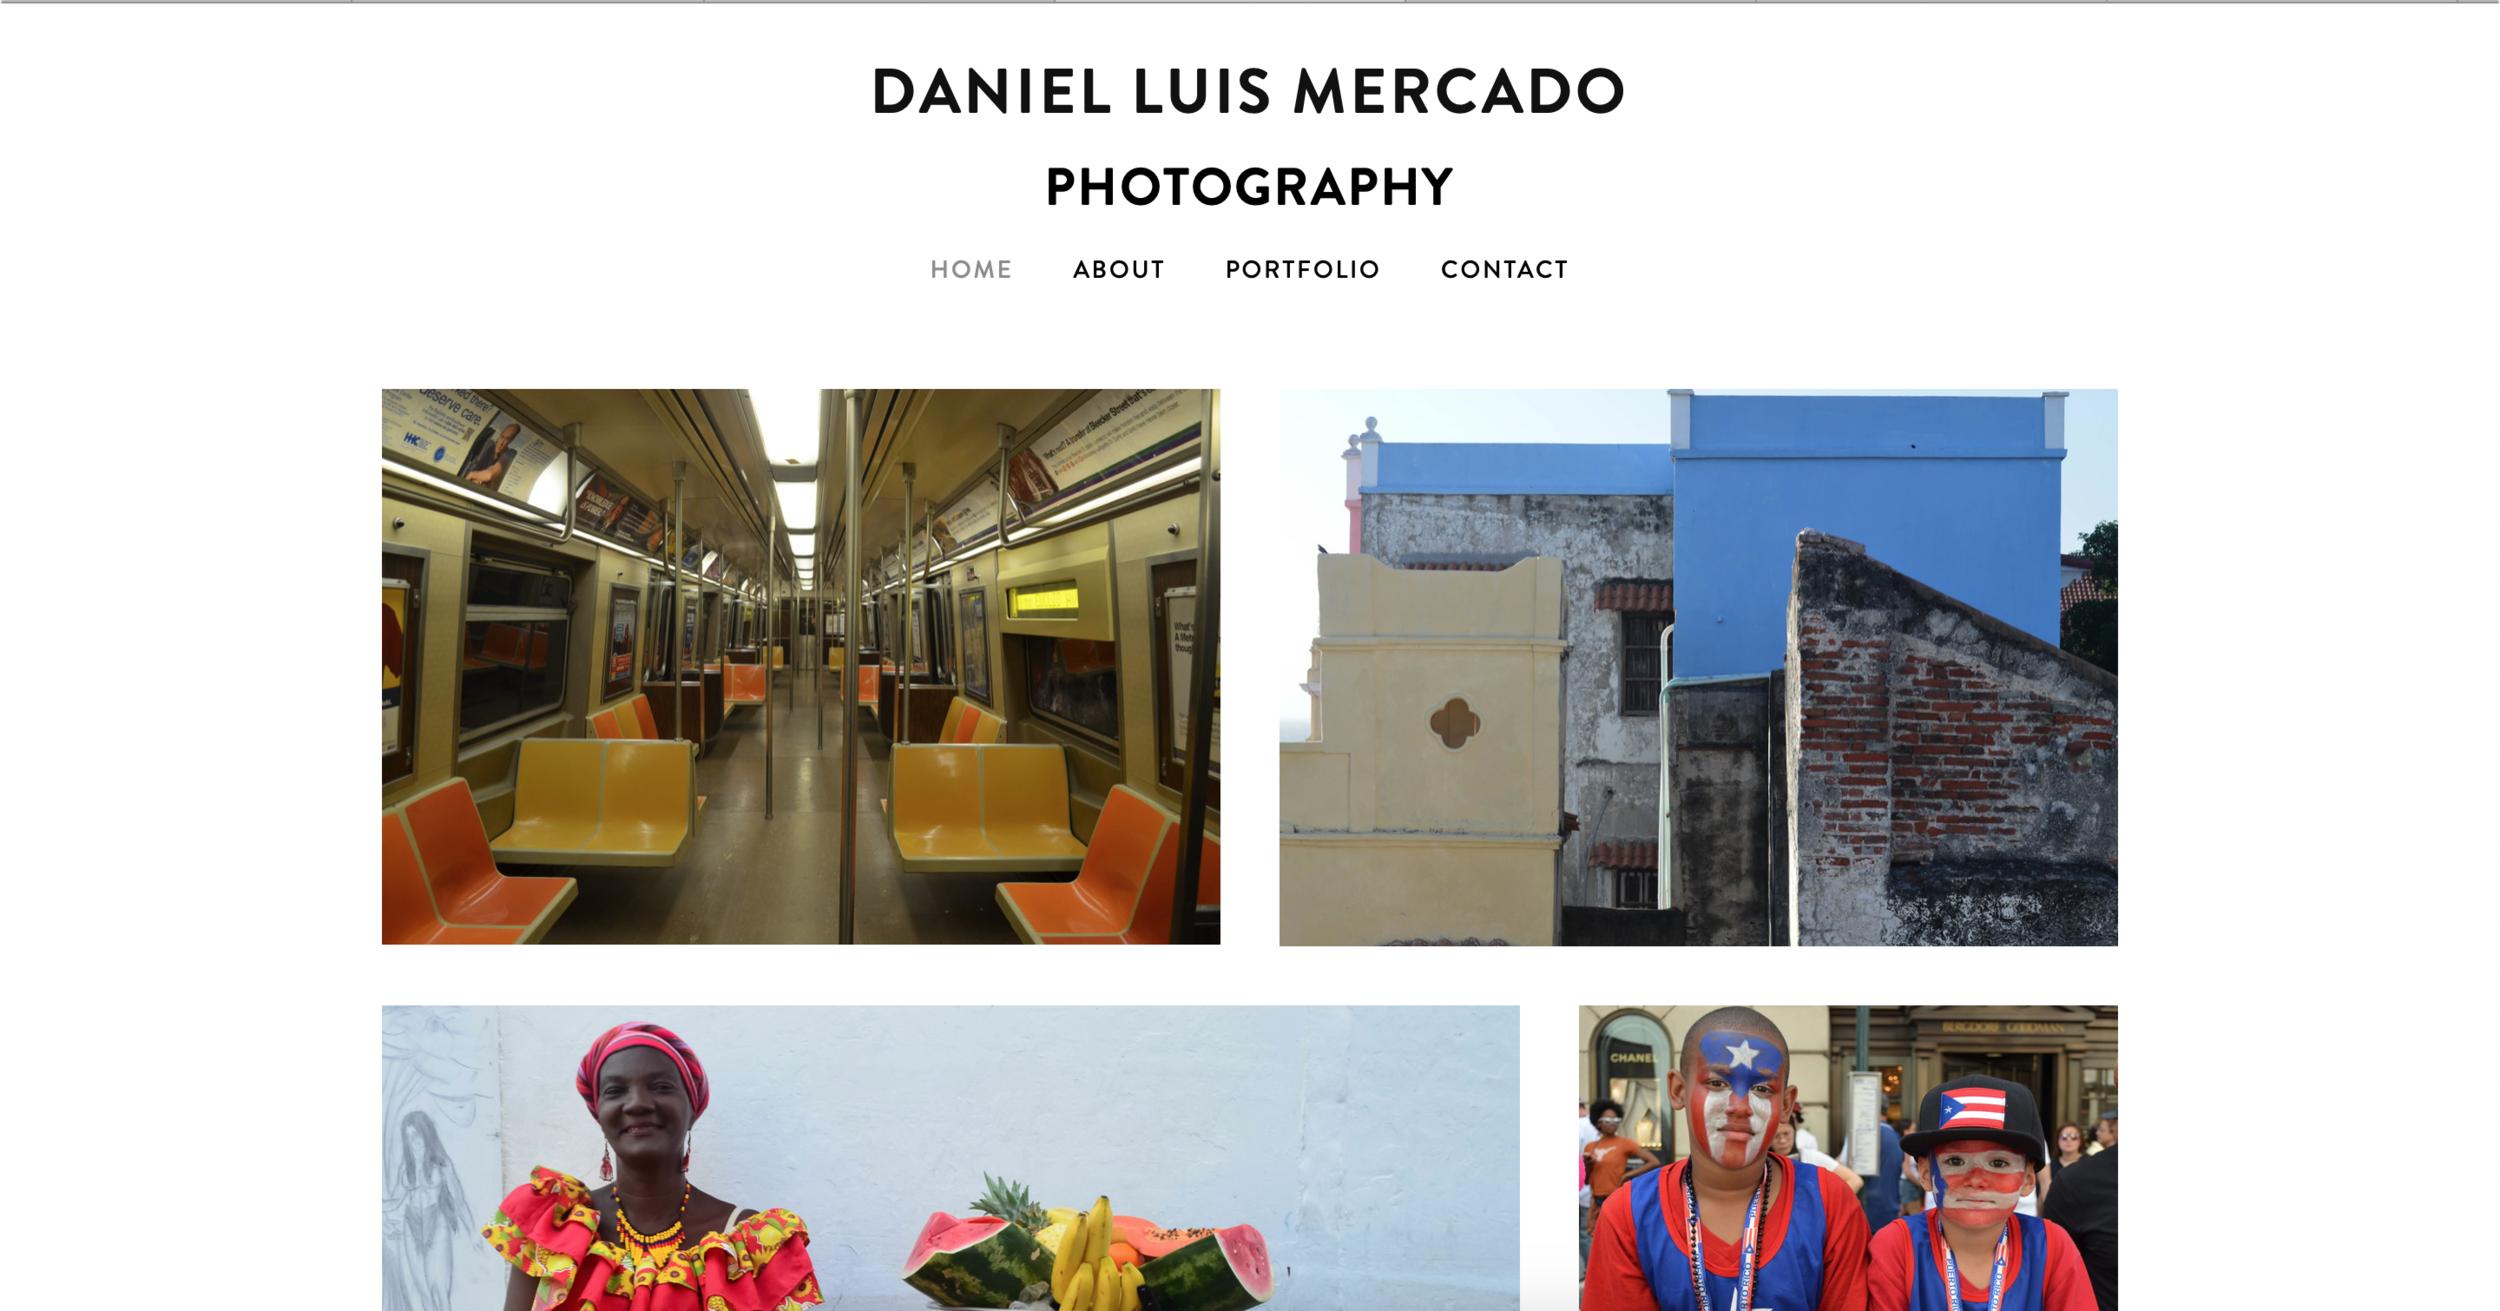 Daniel Luis Mercado - Personal WebsiteClick Here to View